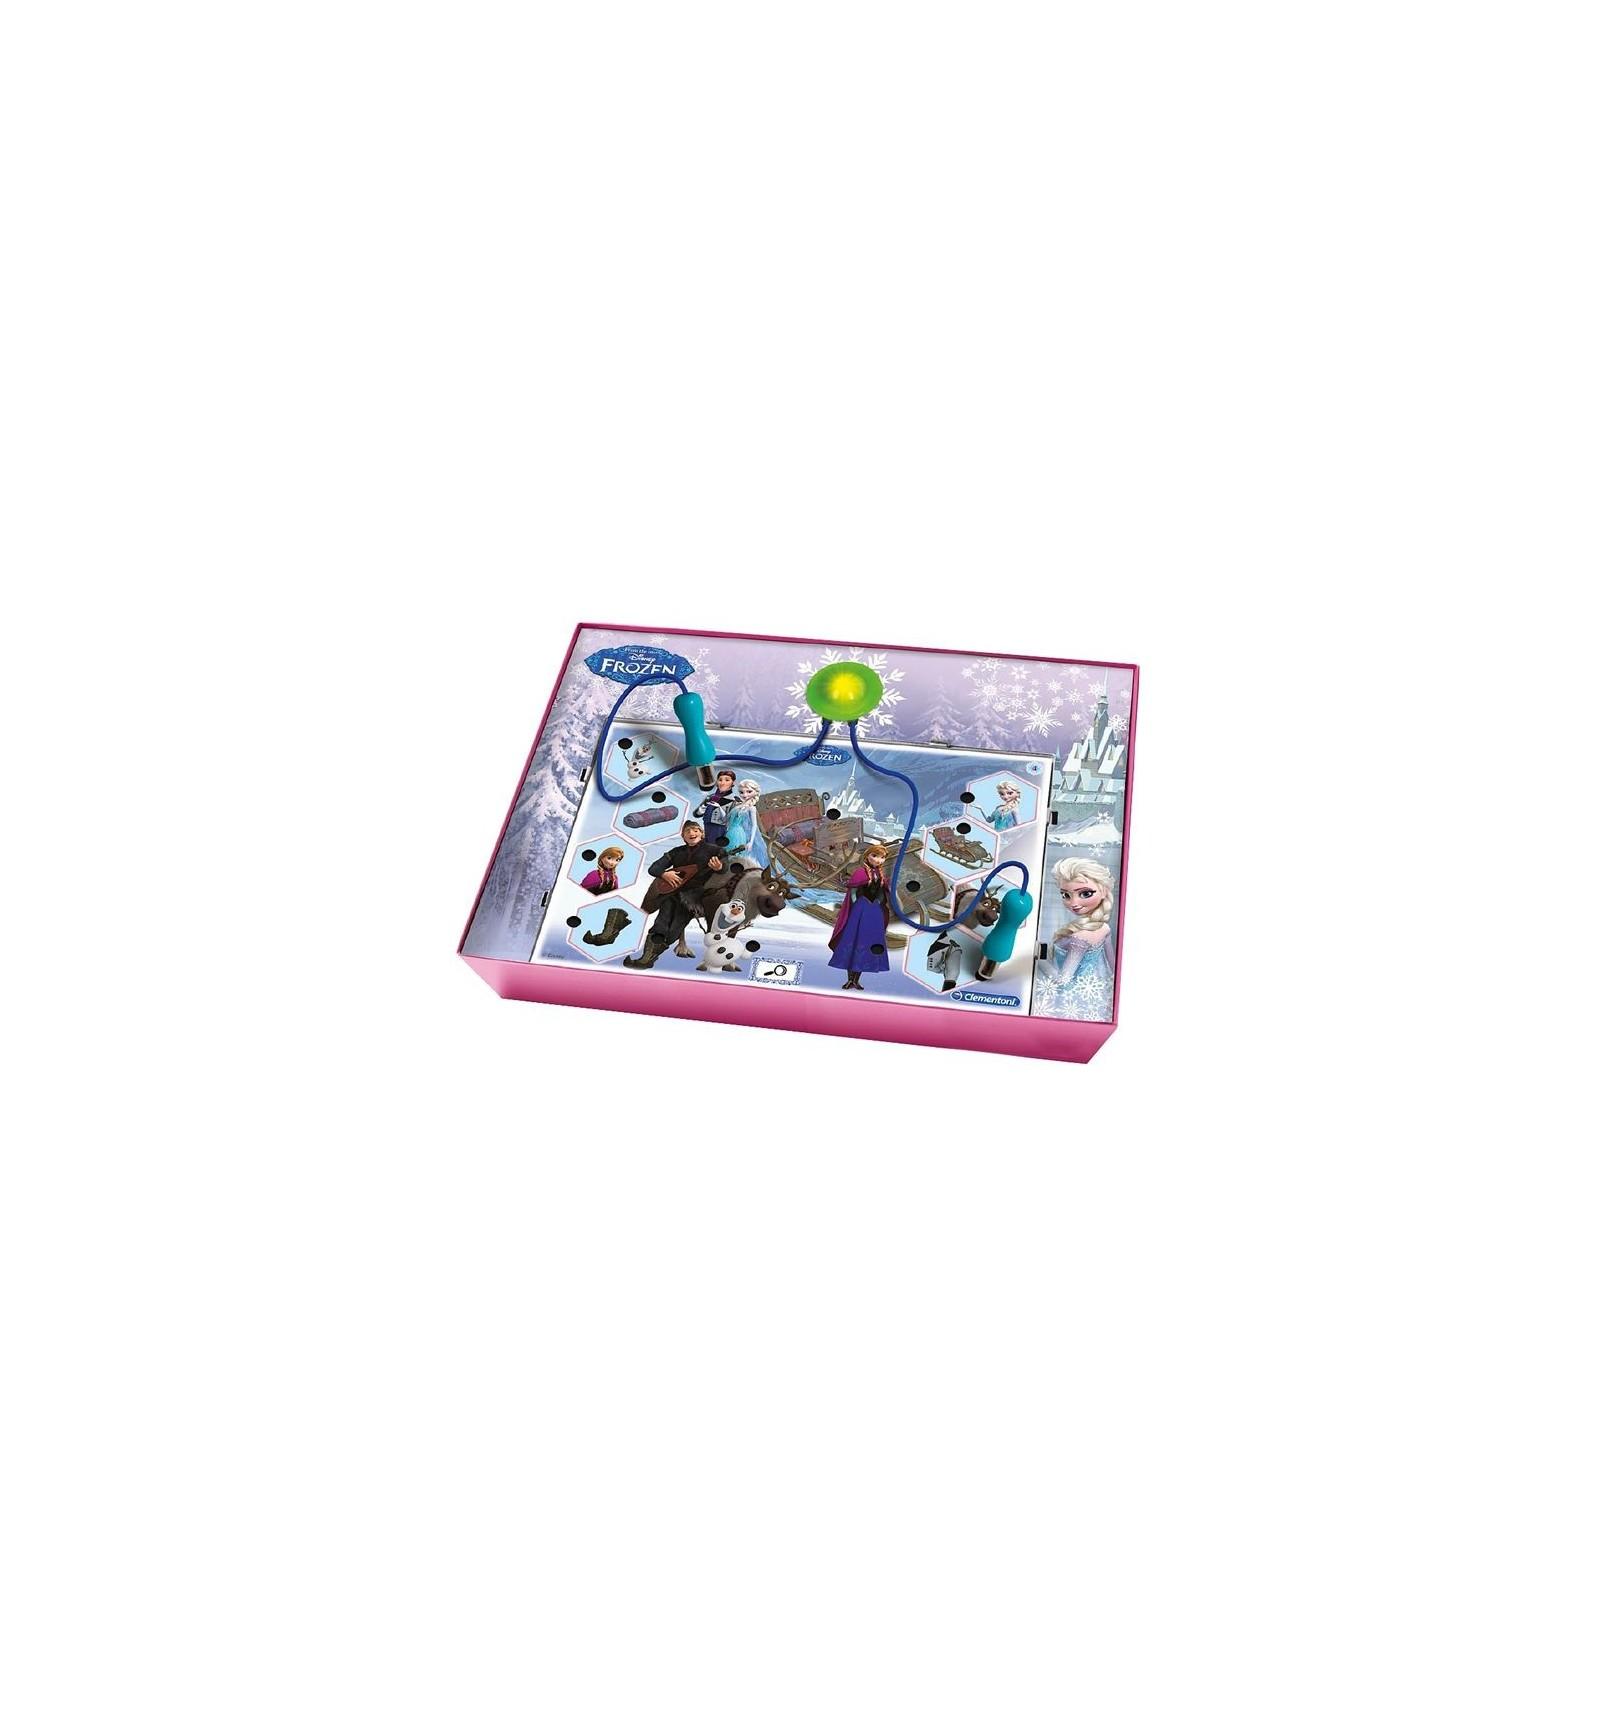 Conecta contesta frozen 2241 juegos de mesa todas las for Time stories juego de mesa